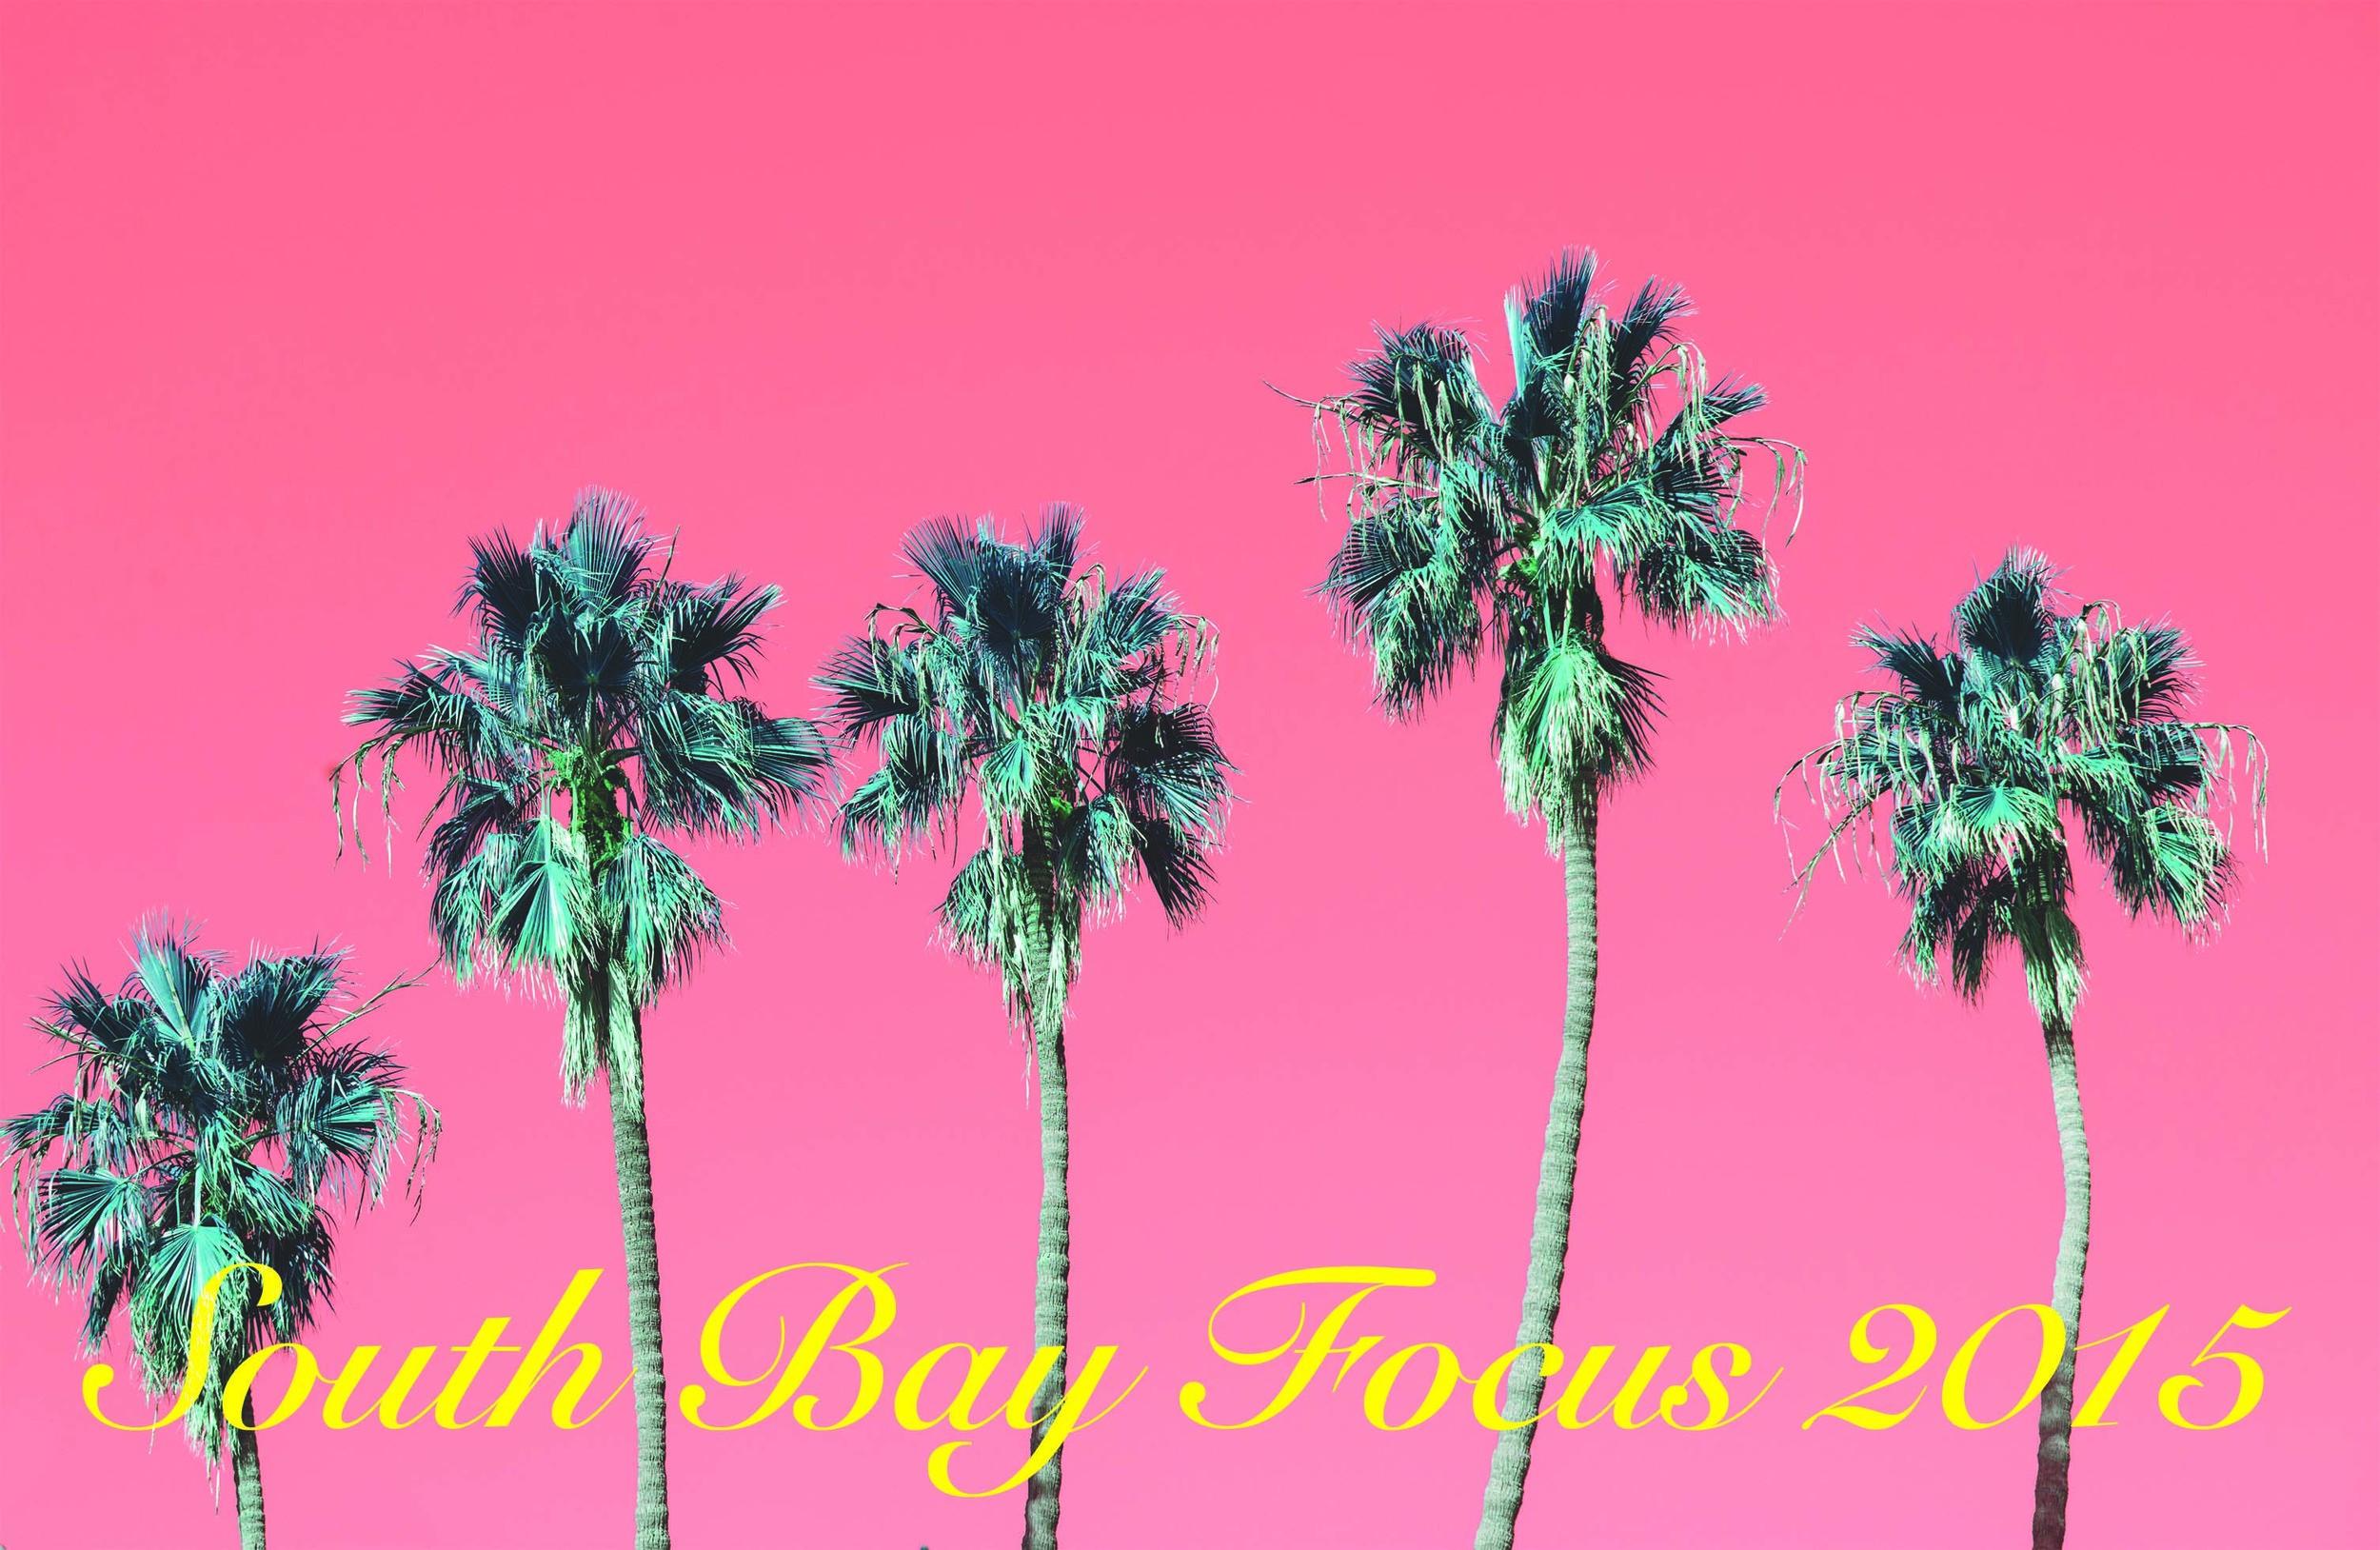 South Bay Focus 2015